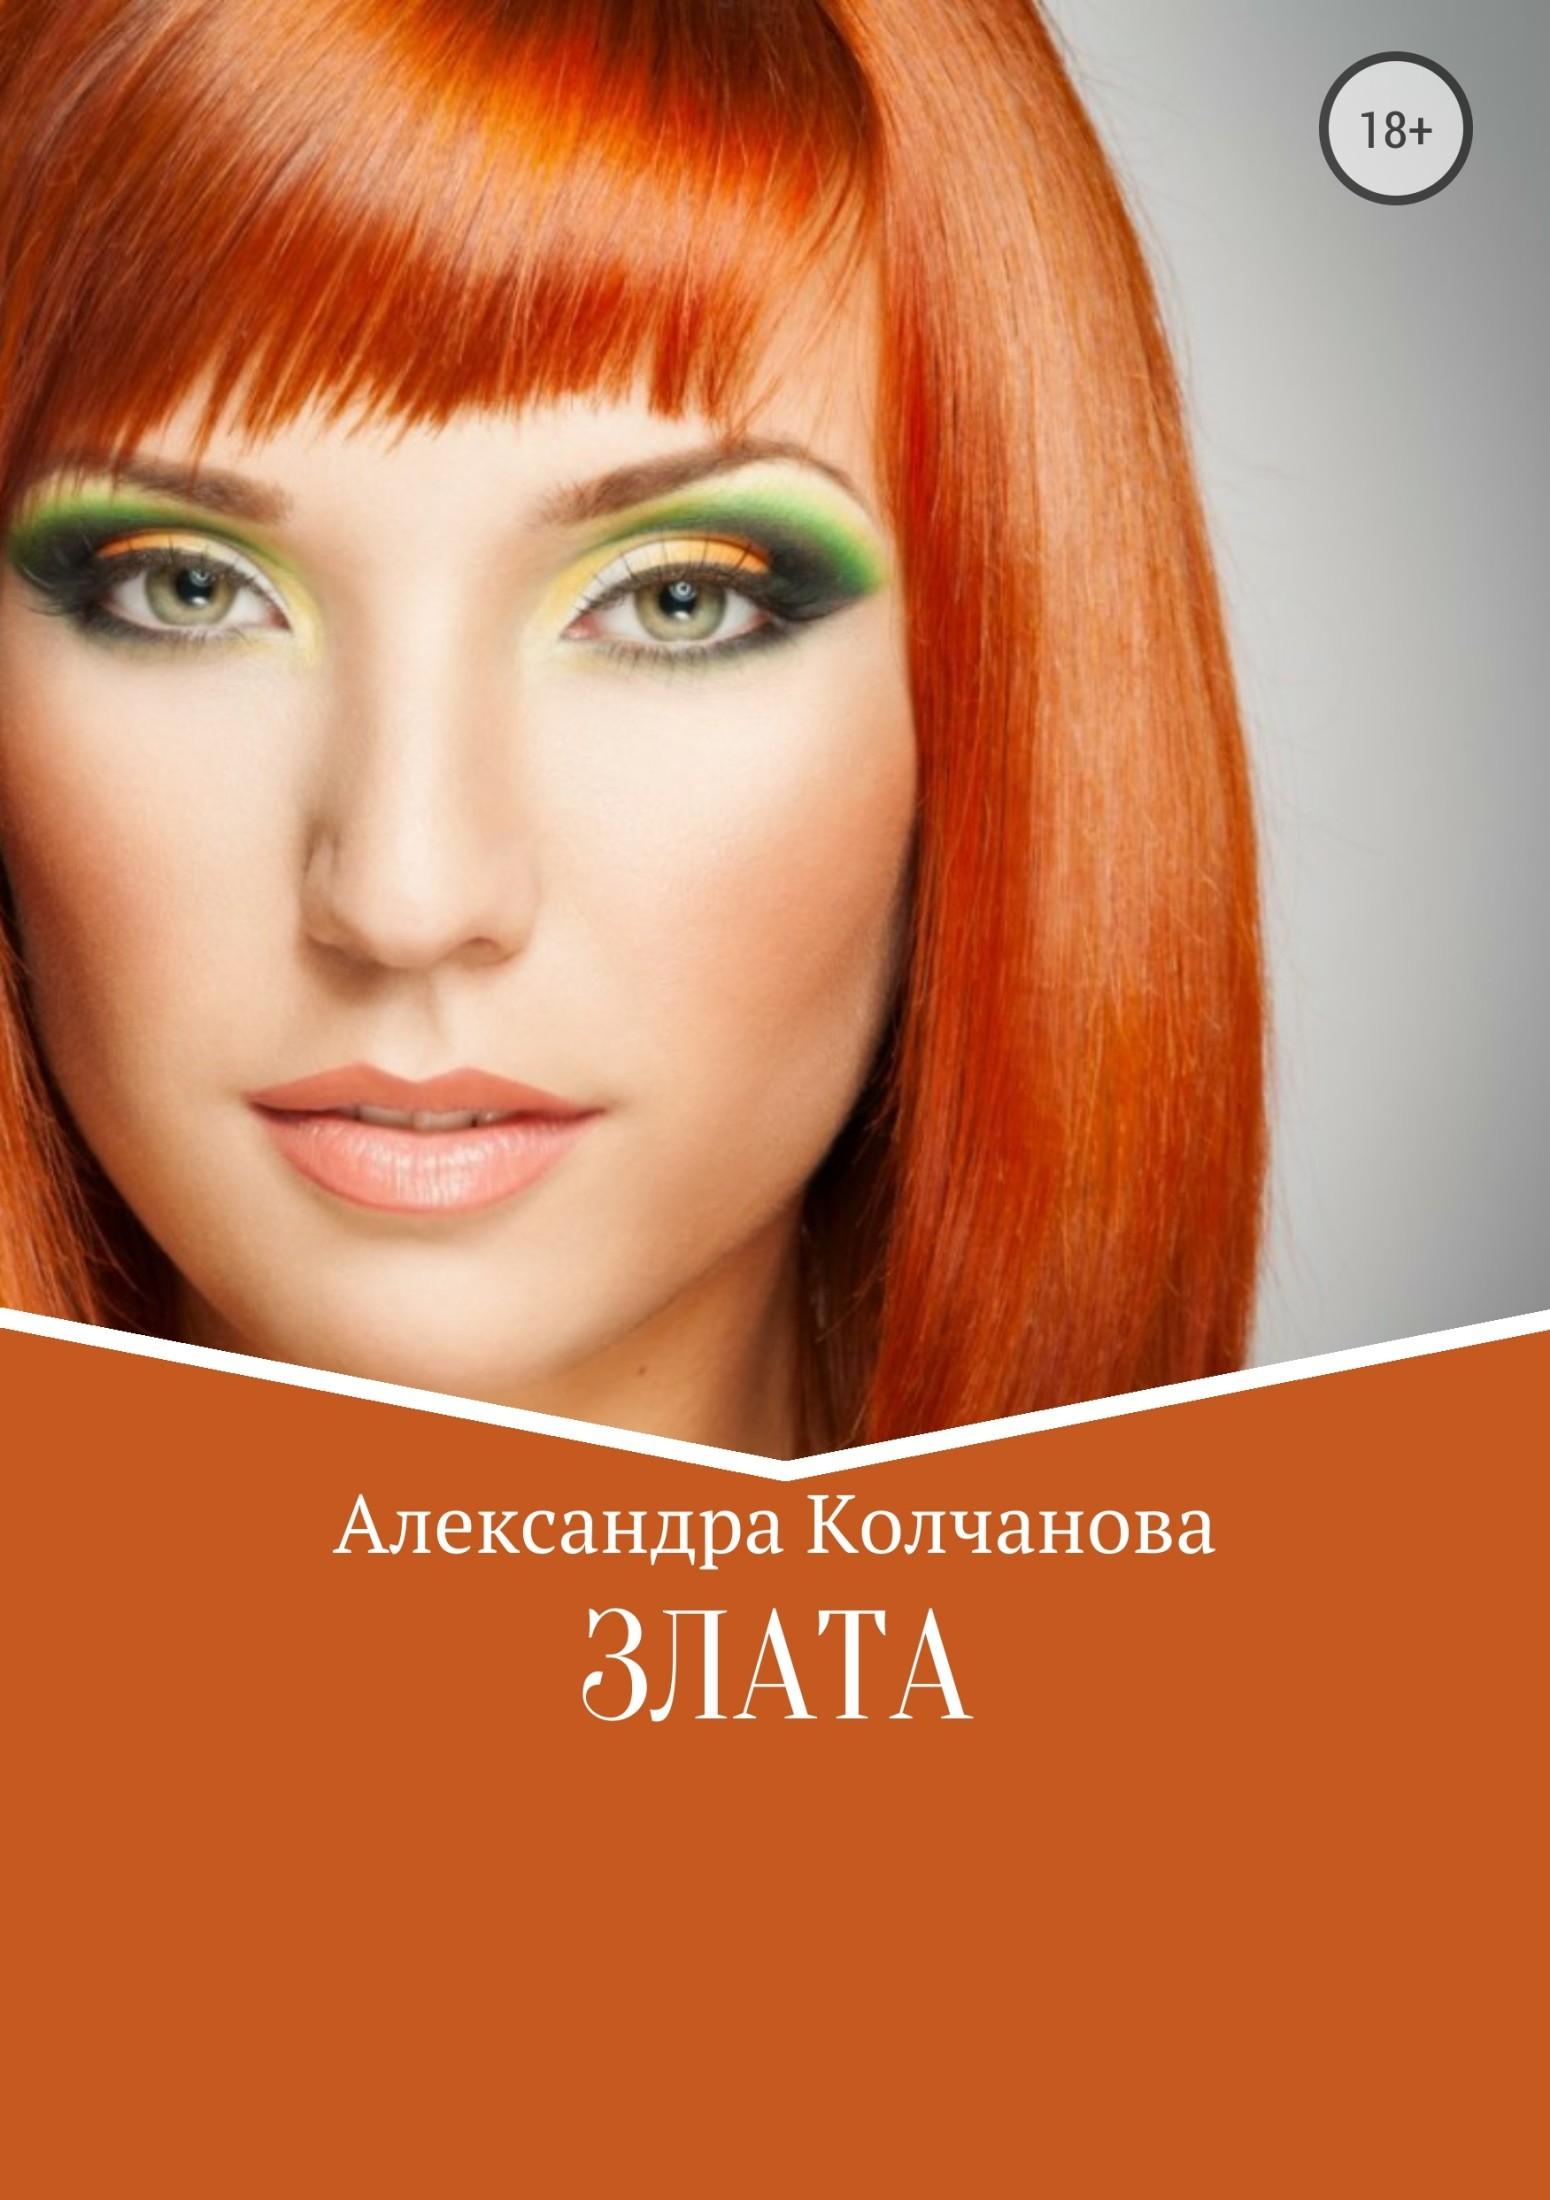 Александра Колчанова Злата